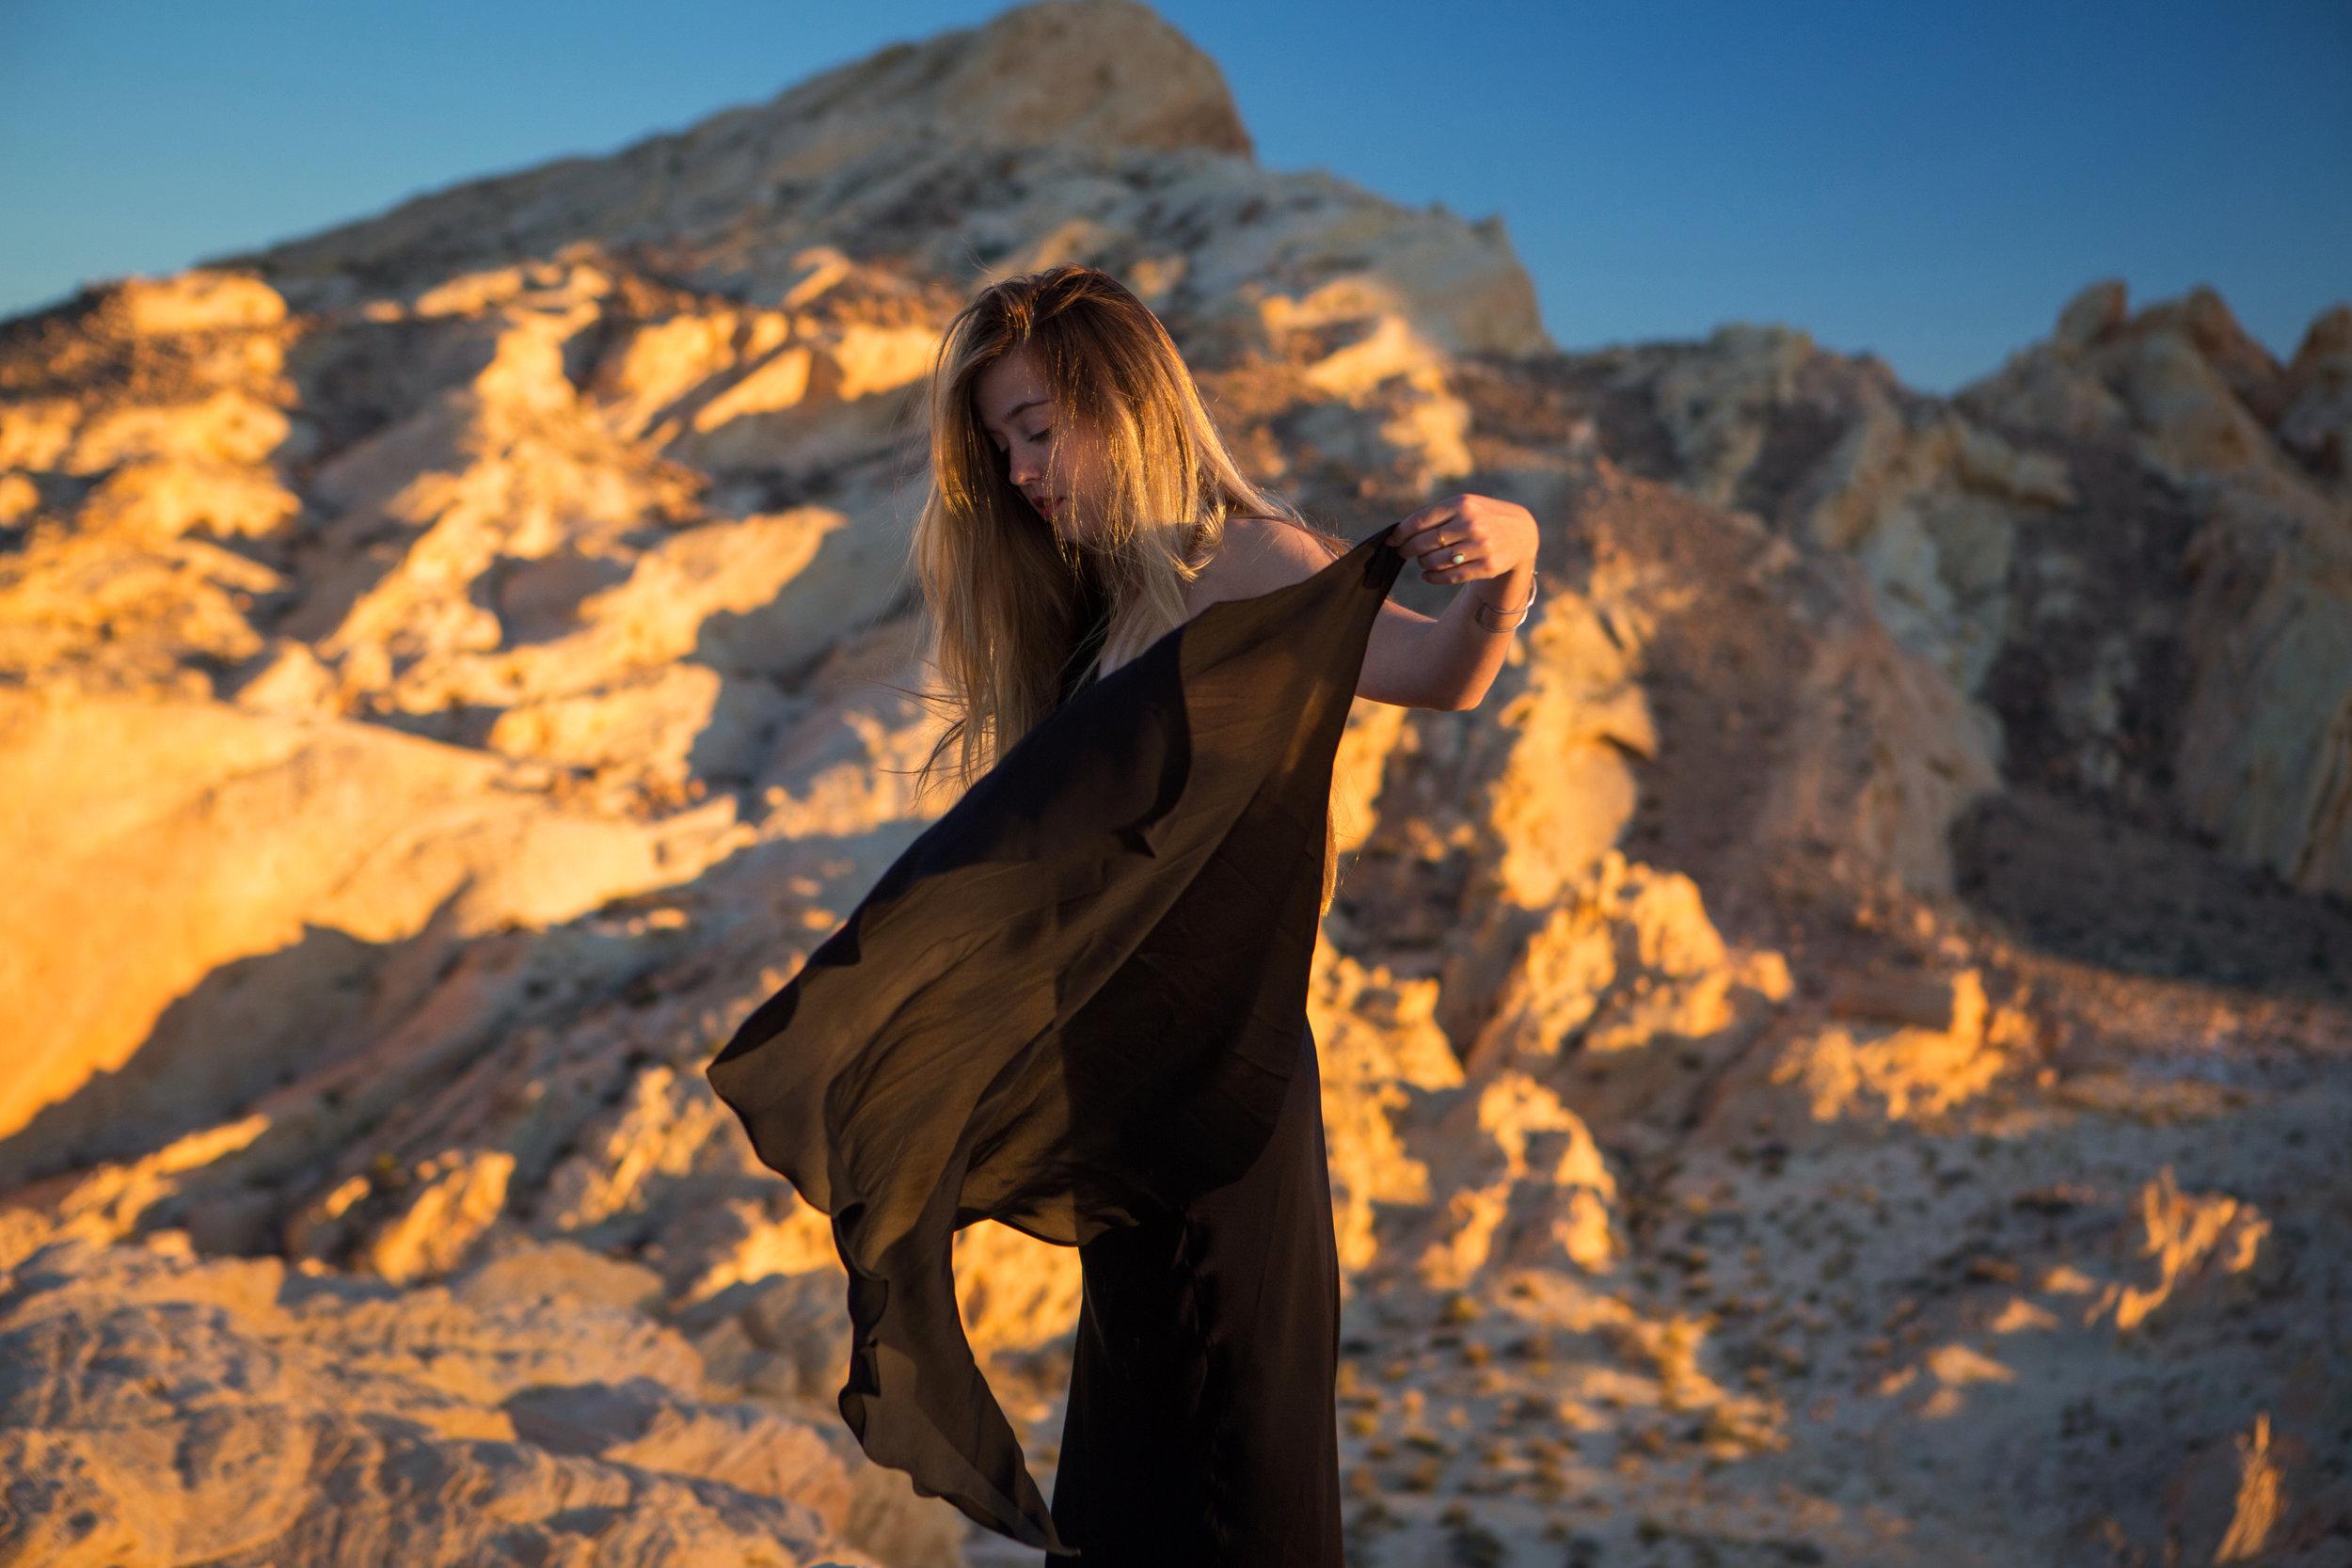 AstroBandit_JordanRose_ValleyofFire_GoldenHour_Fashion_LeonMax_11.jpg